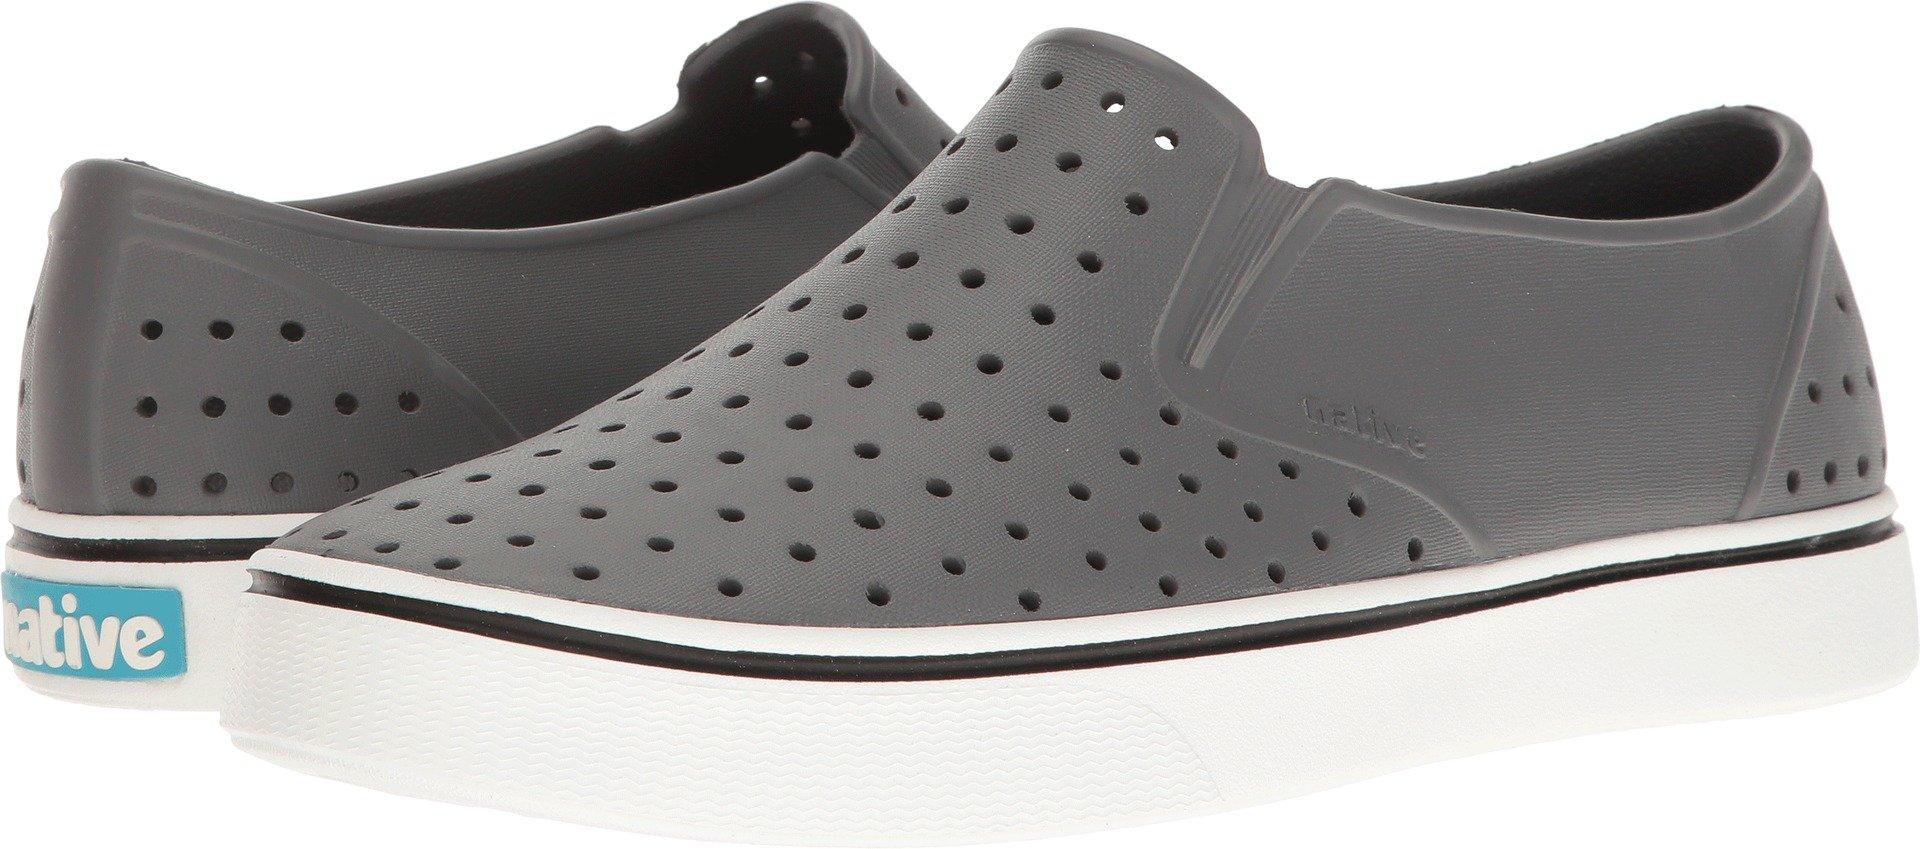 Native Shoes Miles Water Shoe, Dublin Grey/Shell White, 5 Men's (7 B US Women's) M US by Native Shoes